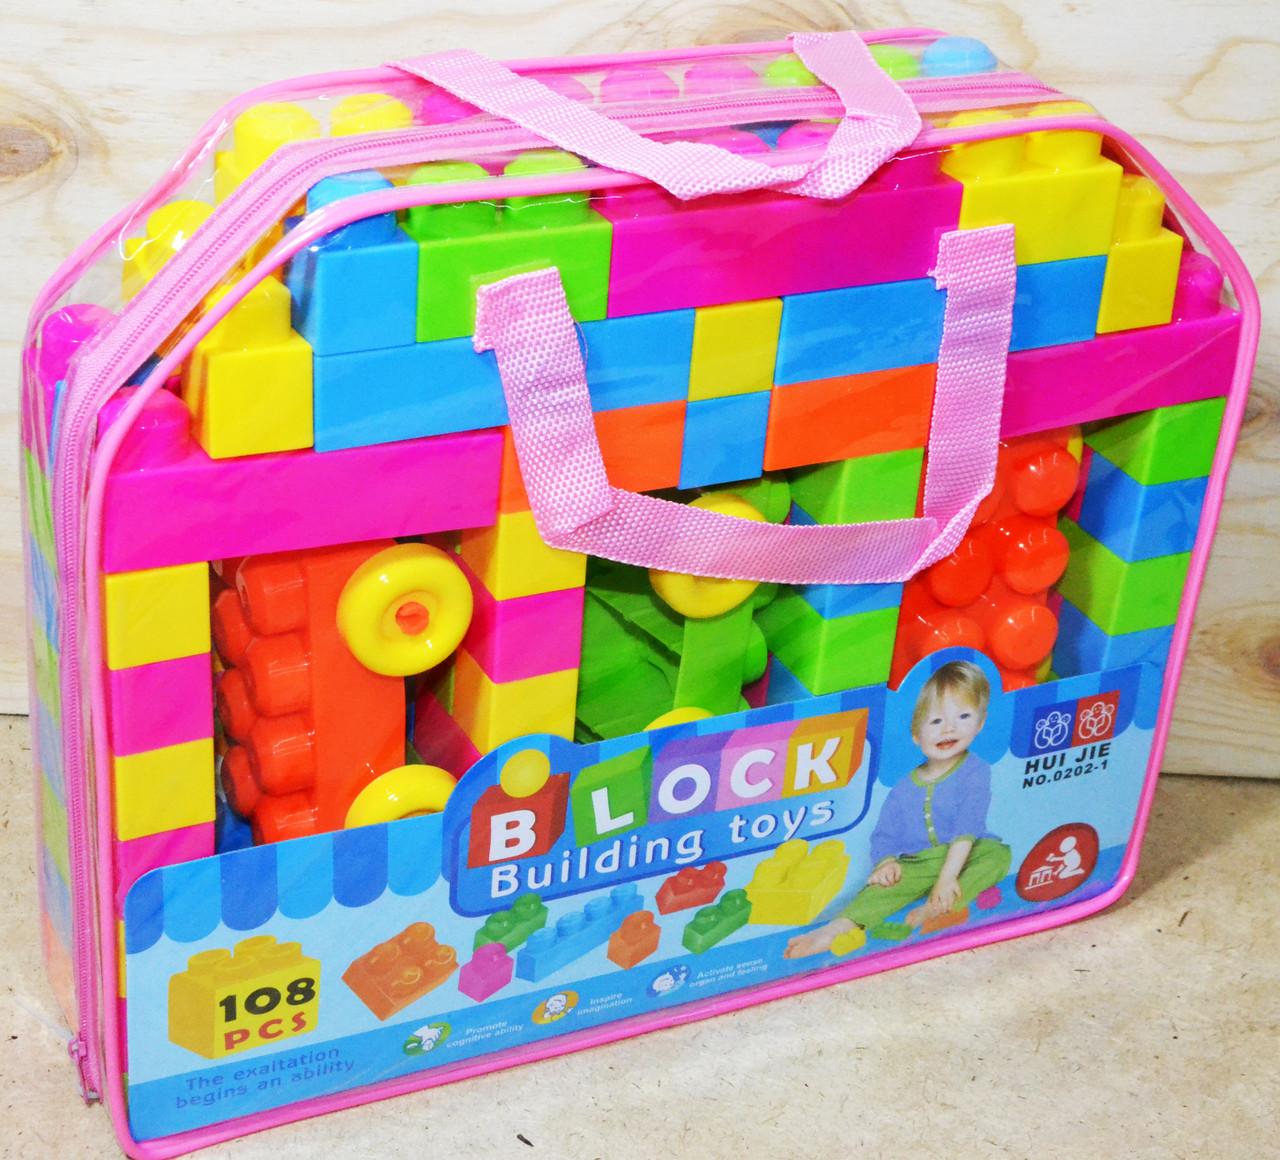 0202-1 Конст. Blocks в сумочке 108дет, 32*26см